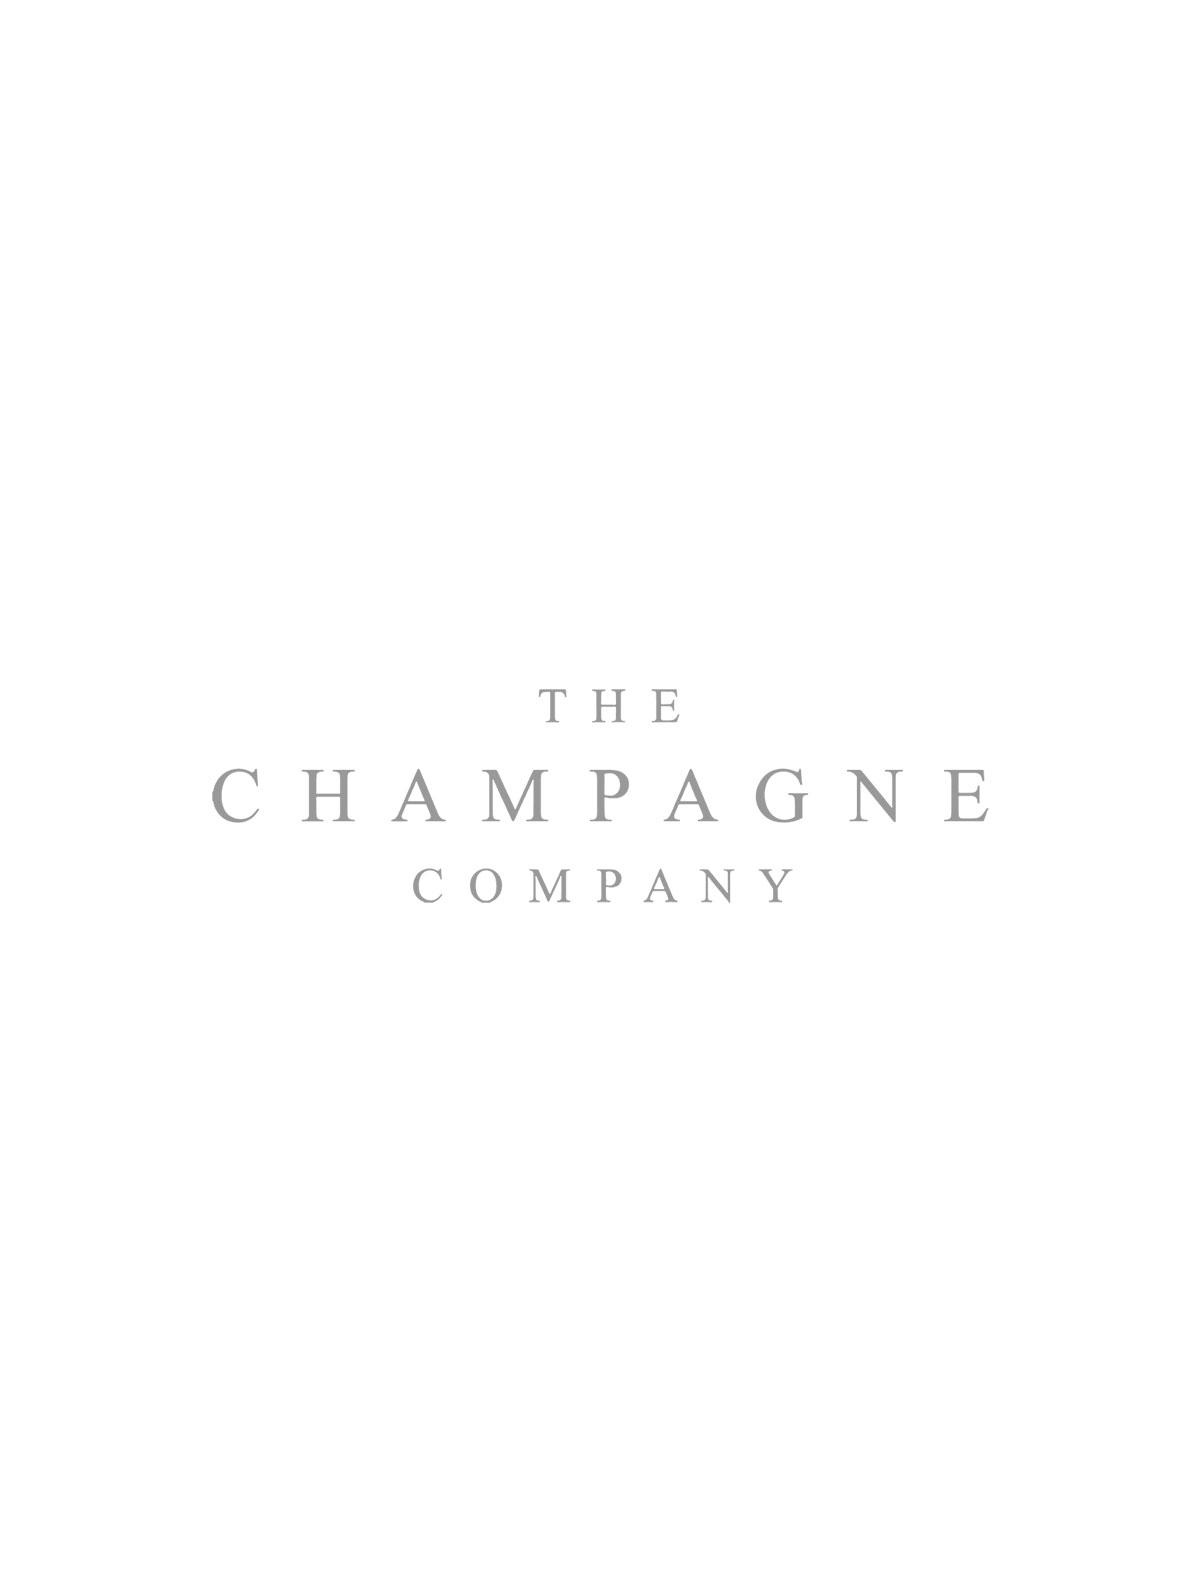 Denbies Whitedowns English Sparkling Rose Wine NV 75cl